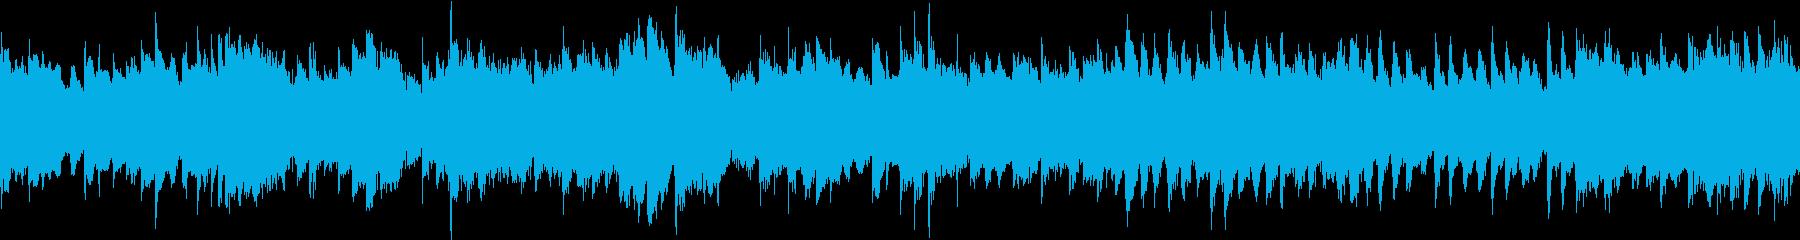 C【ループ】幻想 感動 溢れる感情の再生済みの波形